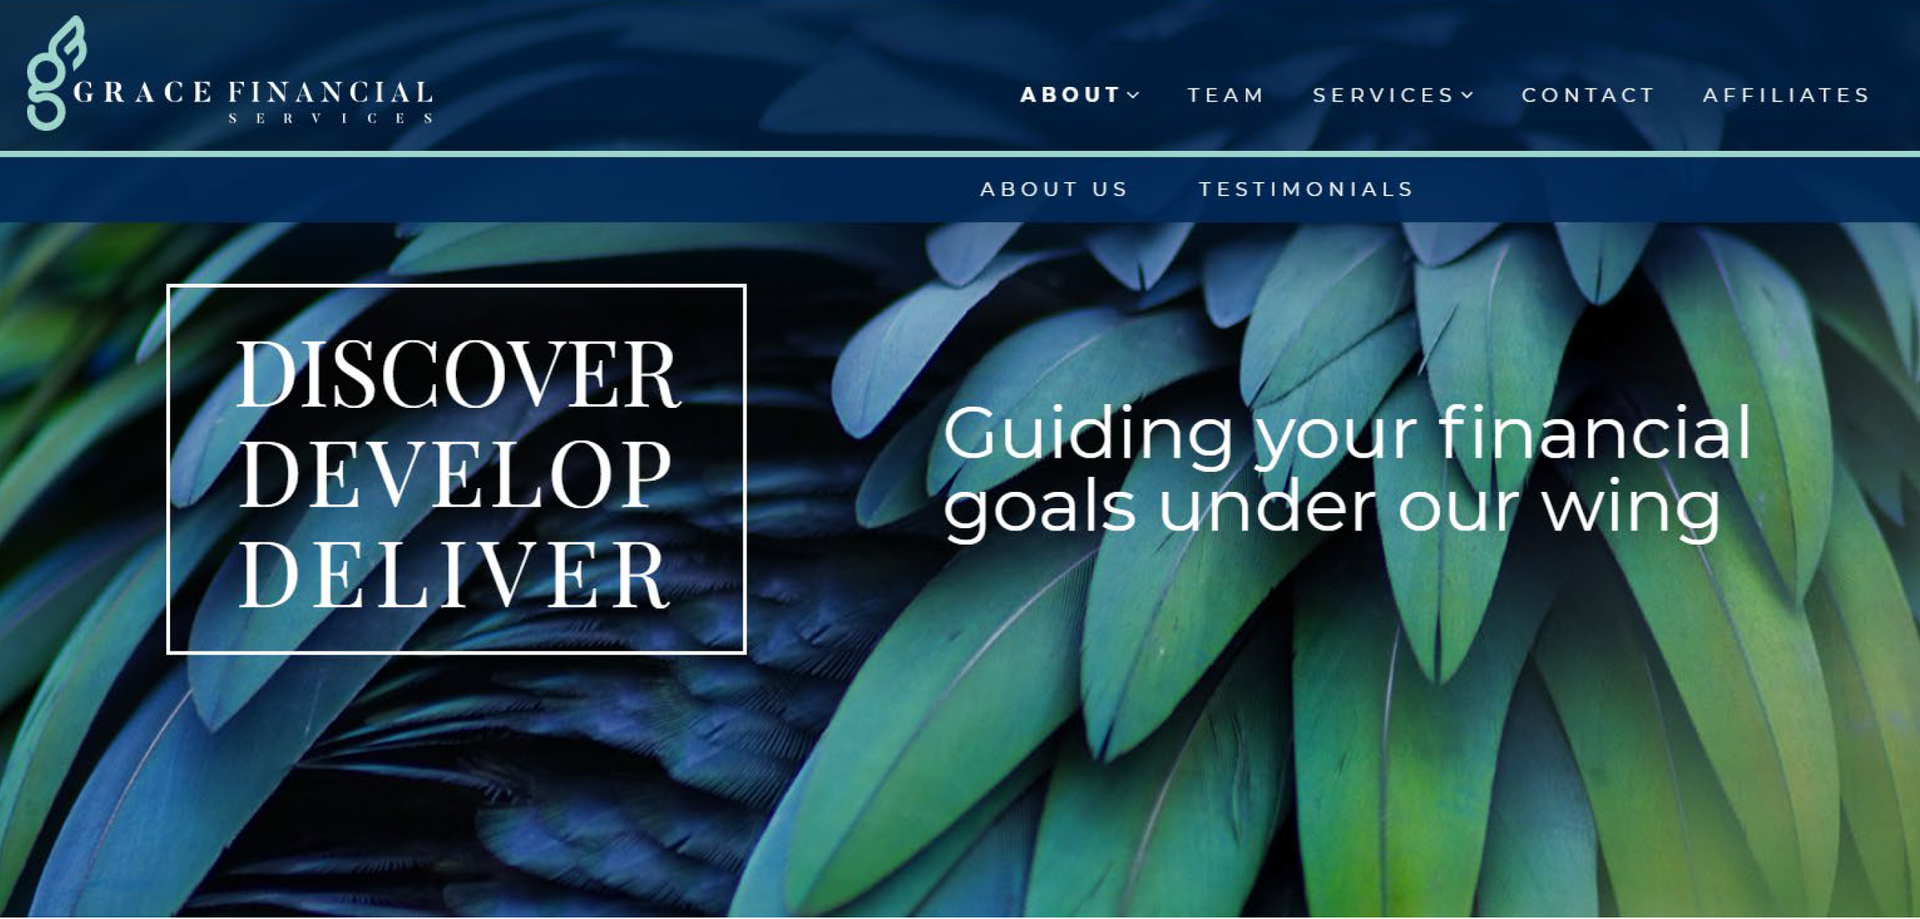 GFS Home Page Nav Bar